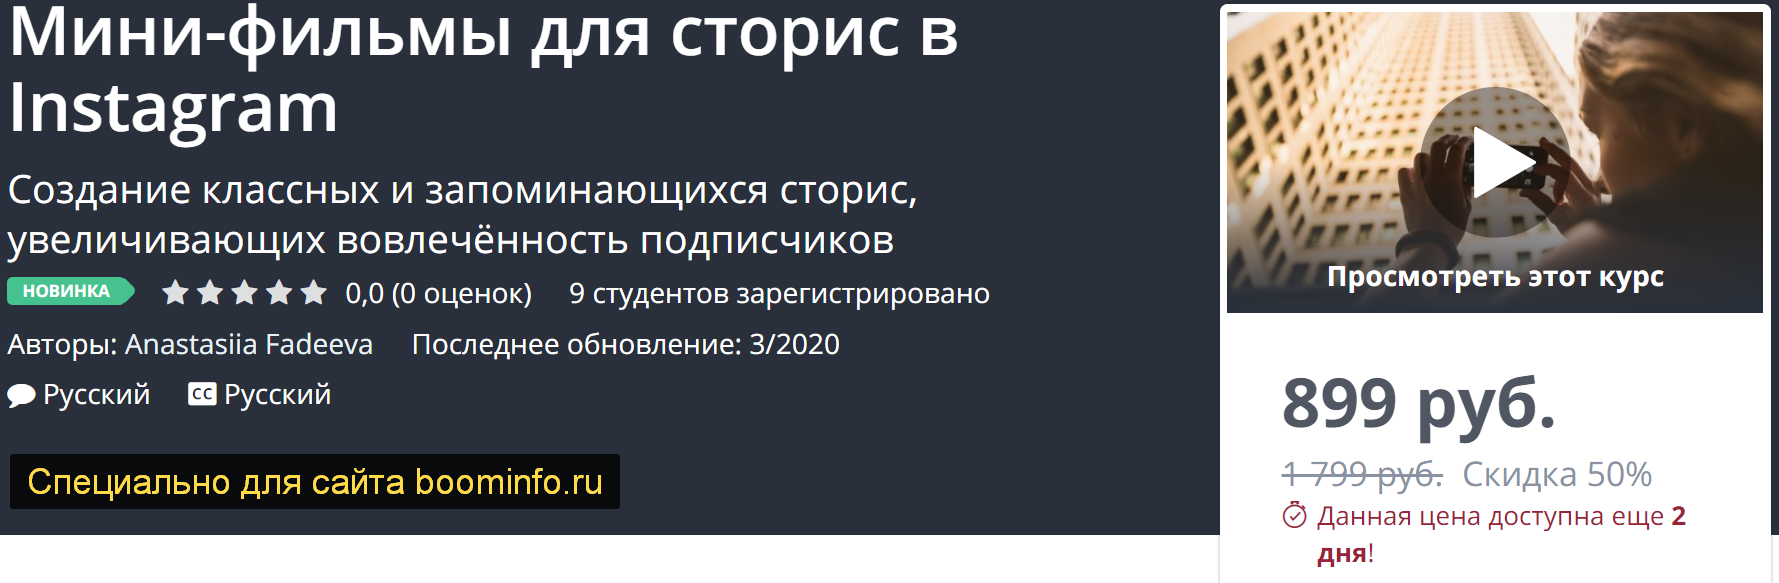 2020-03-18_21-02-43